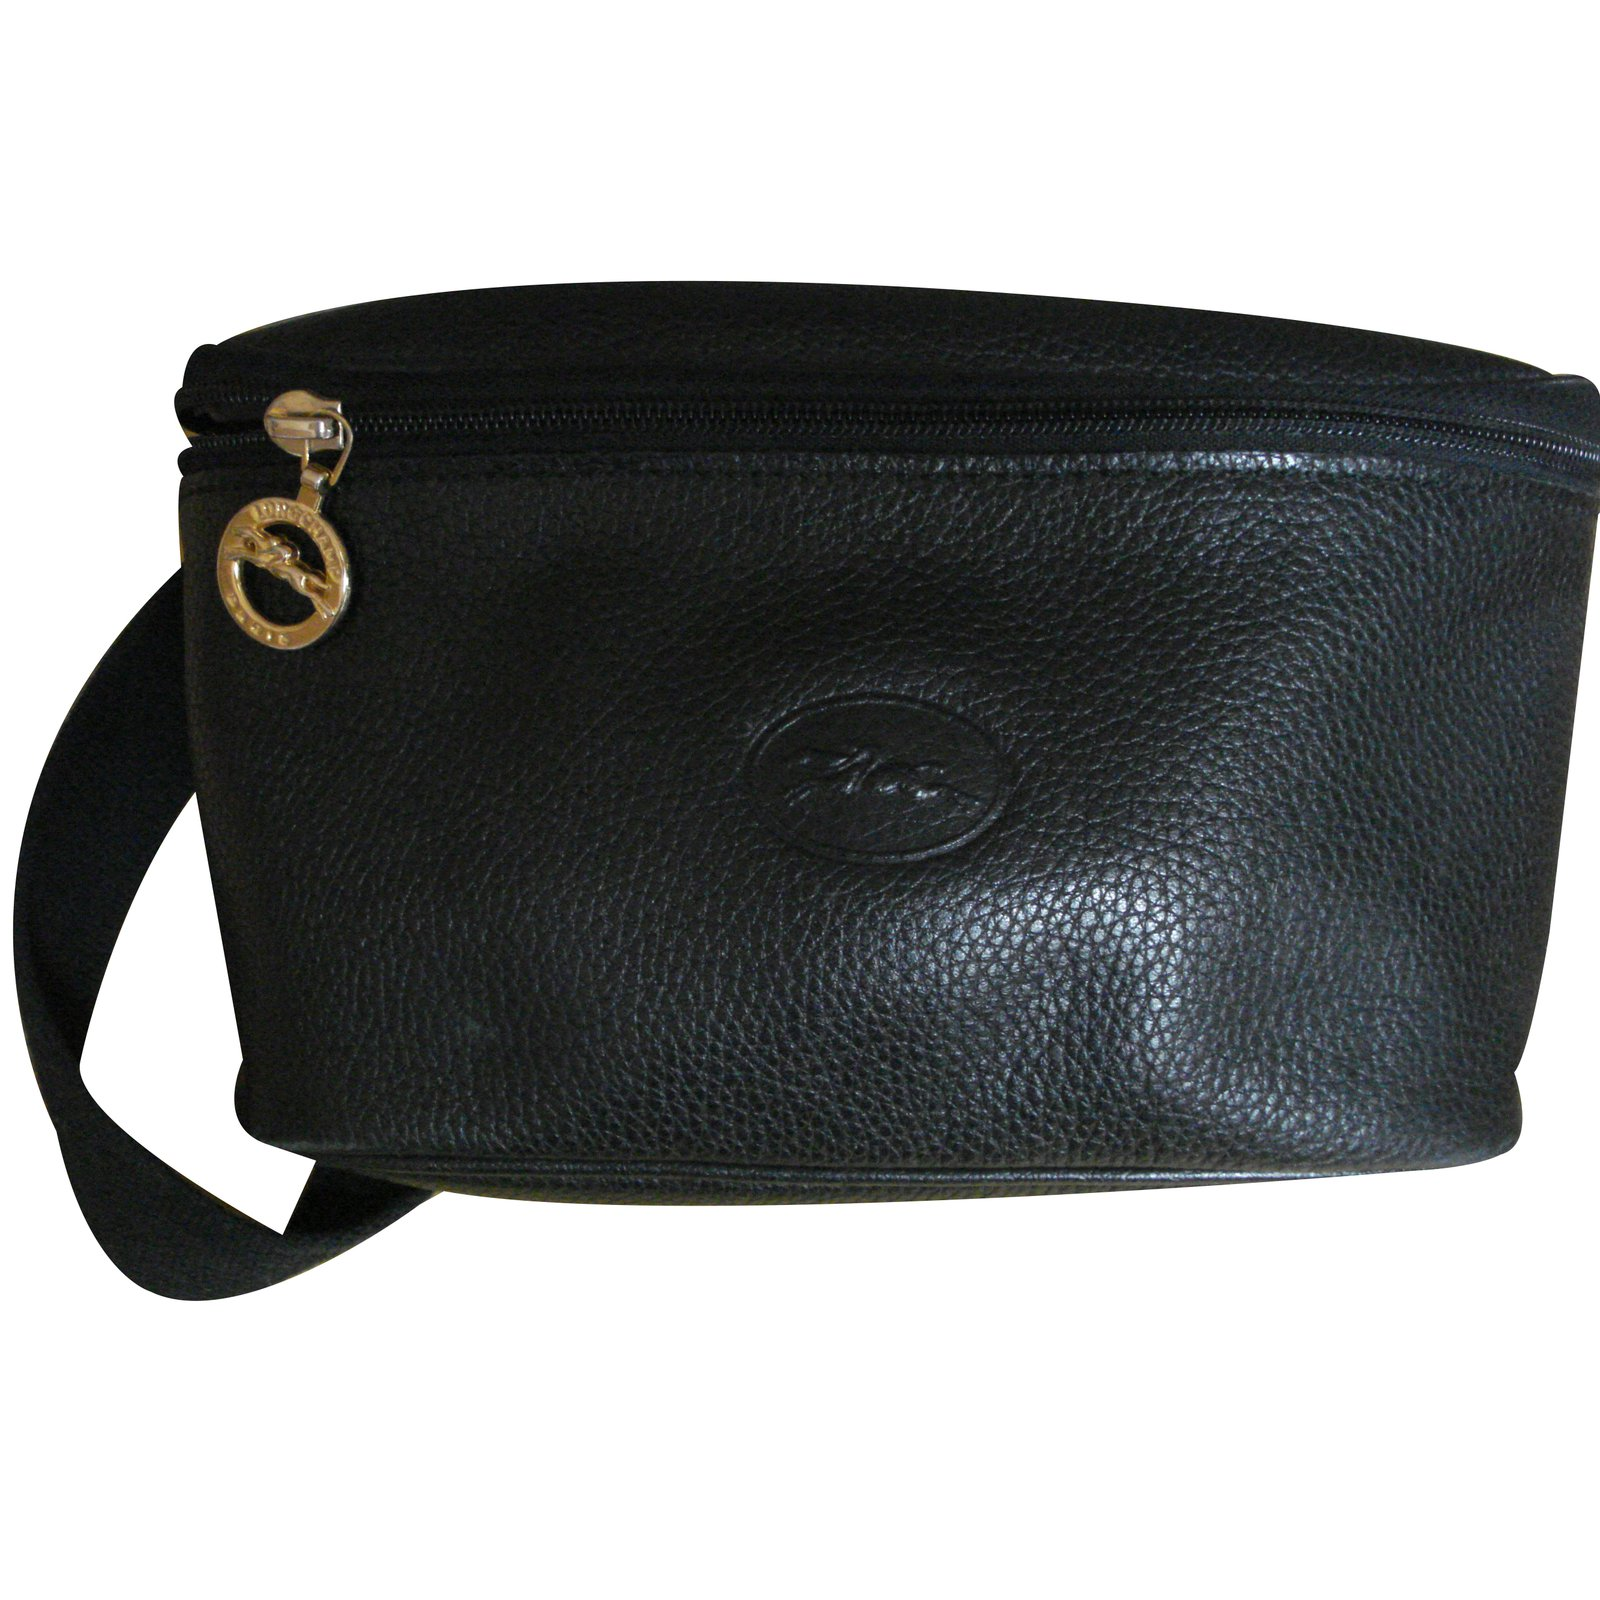 sacs longchamp sac banane cuir noir joli closet. Black Bedroom Furniture Sets. Home Design Ideas